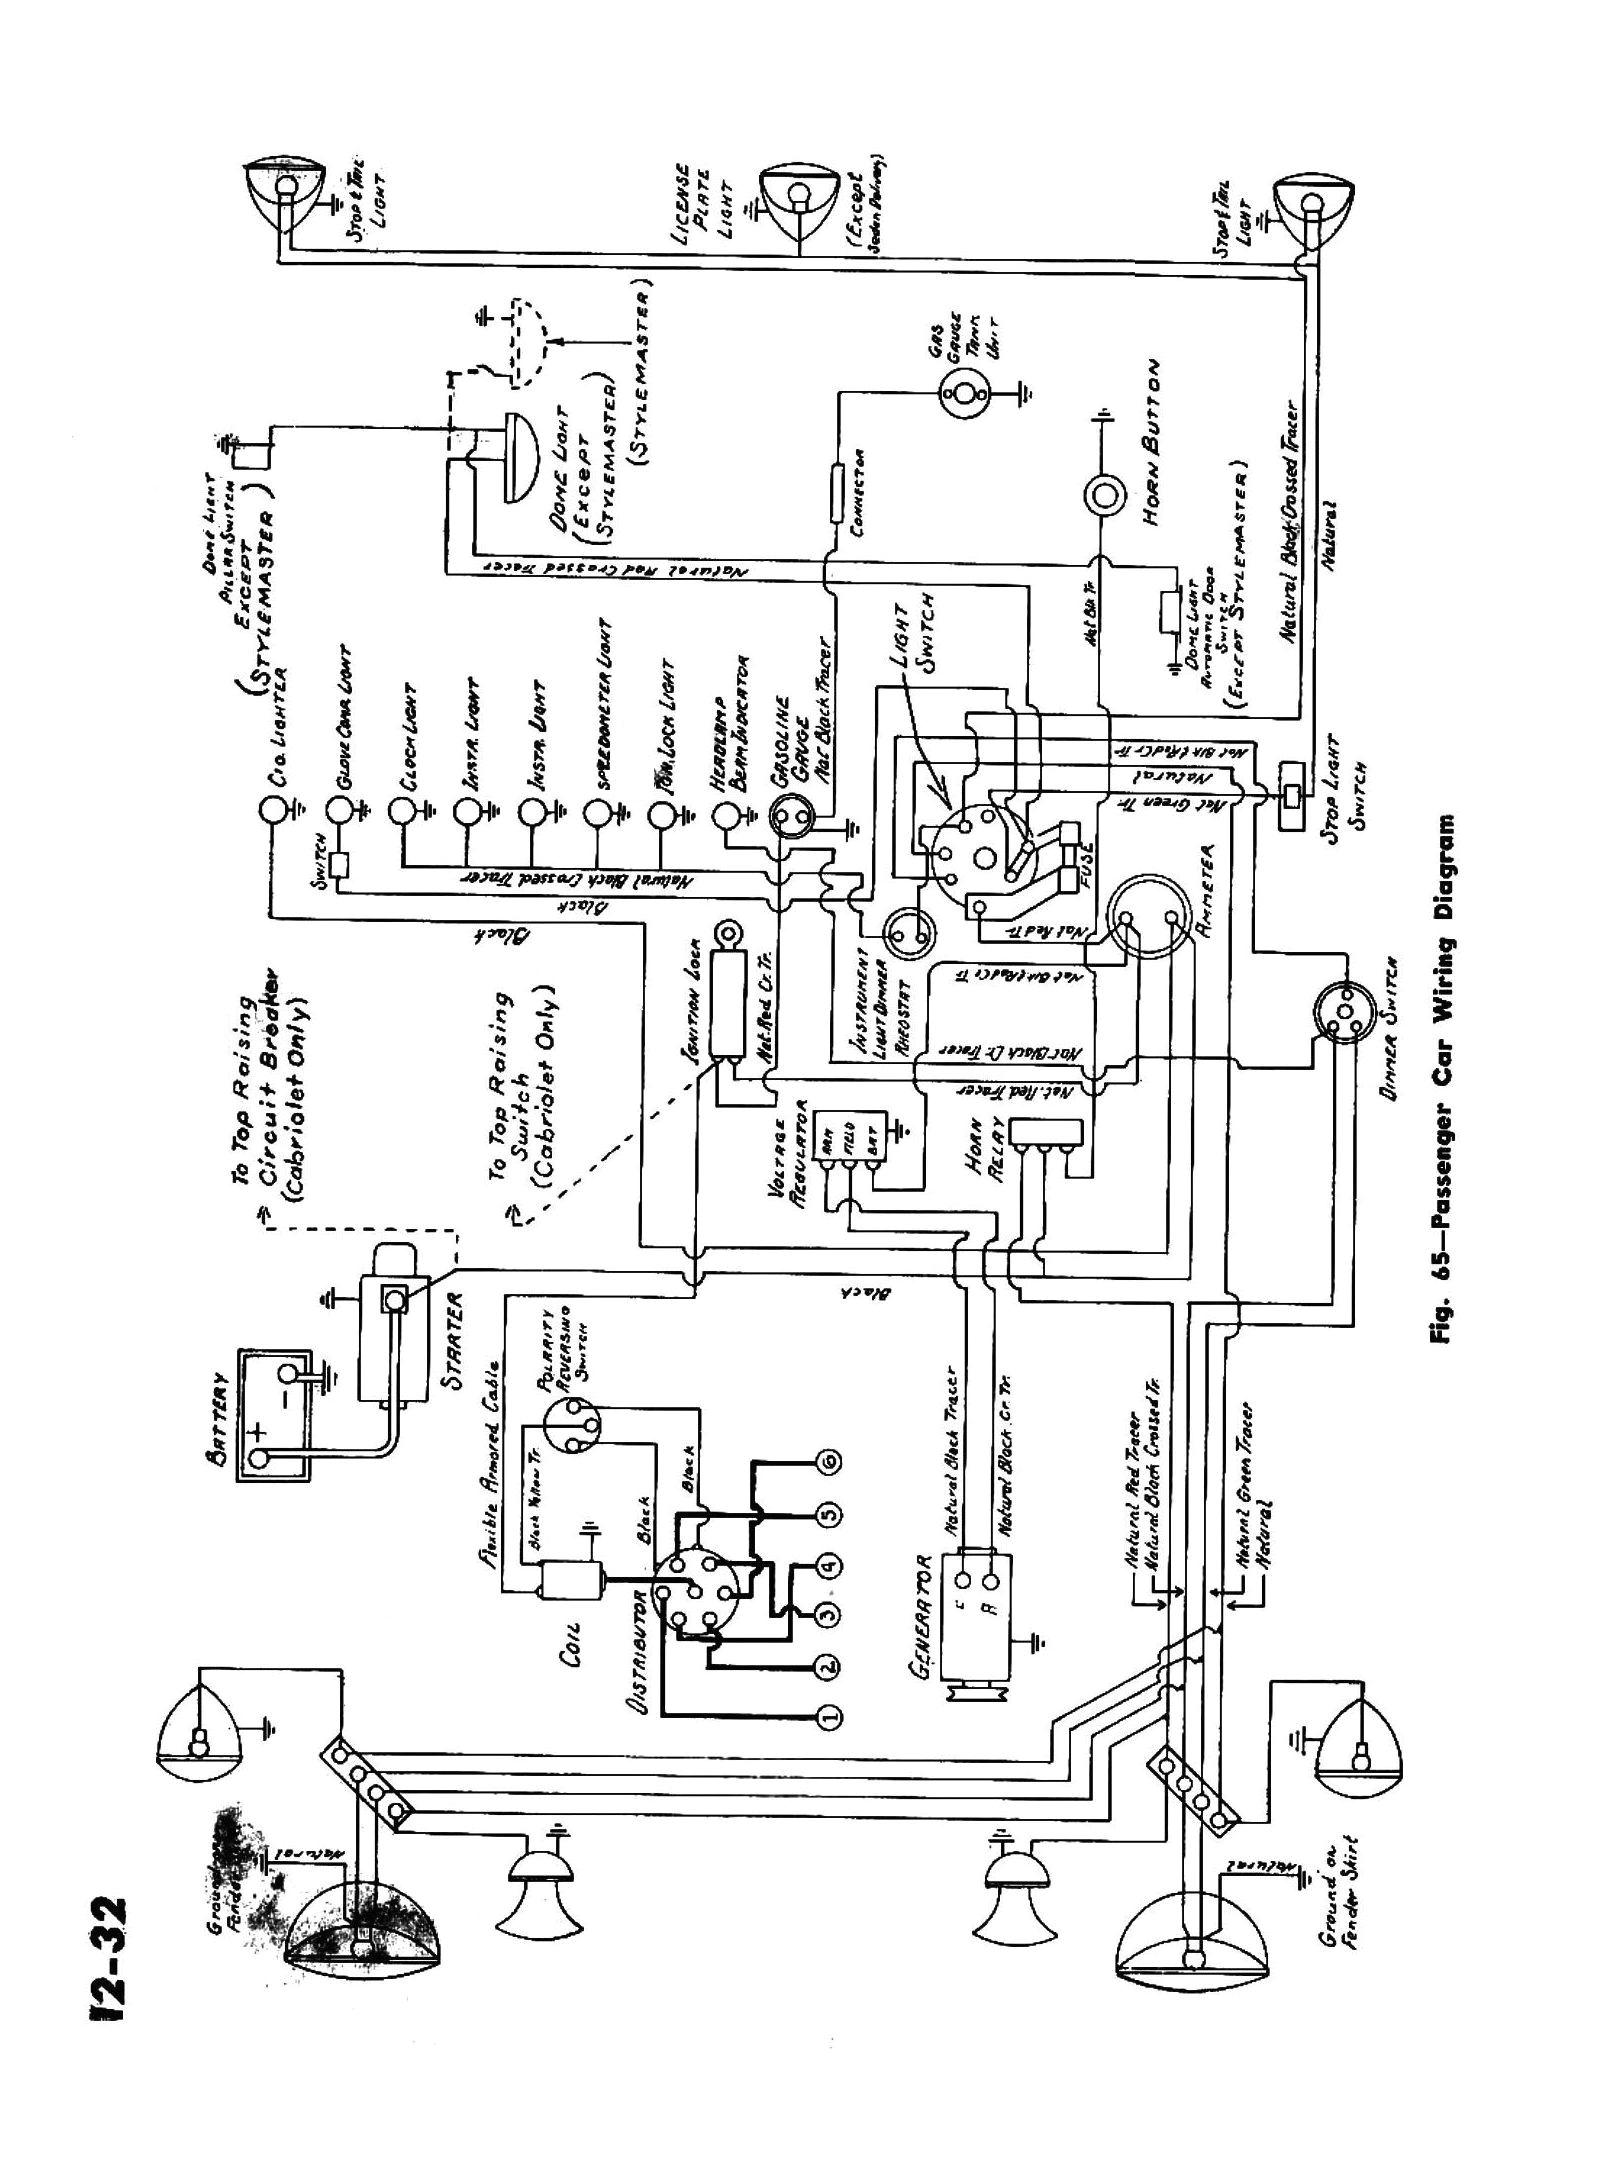 chevy wiring diagrams1945 passenger car wiring